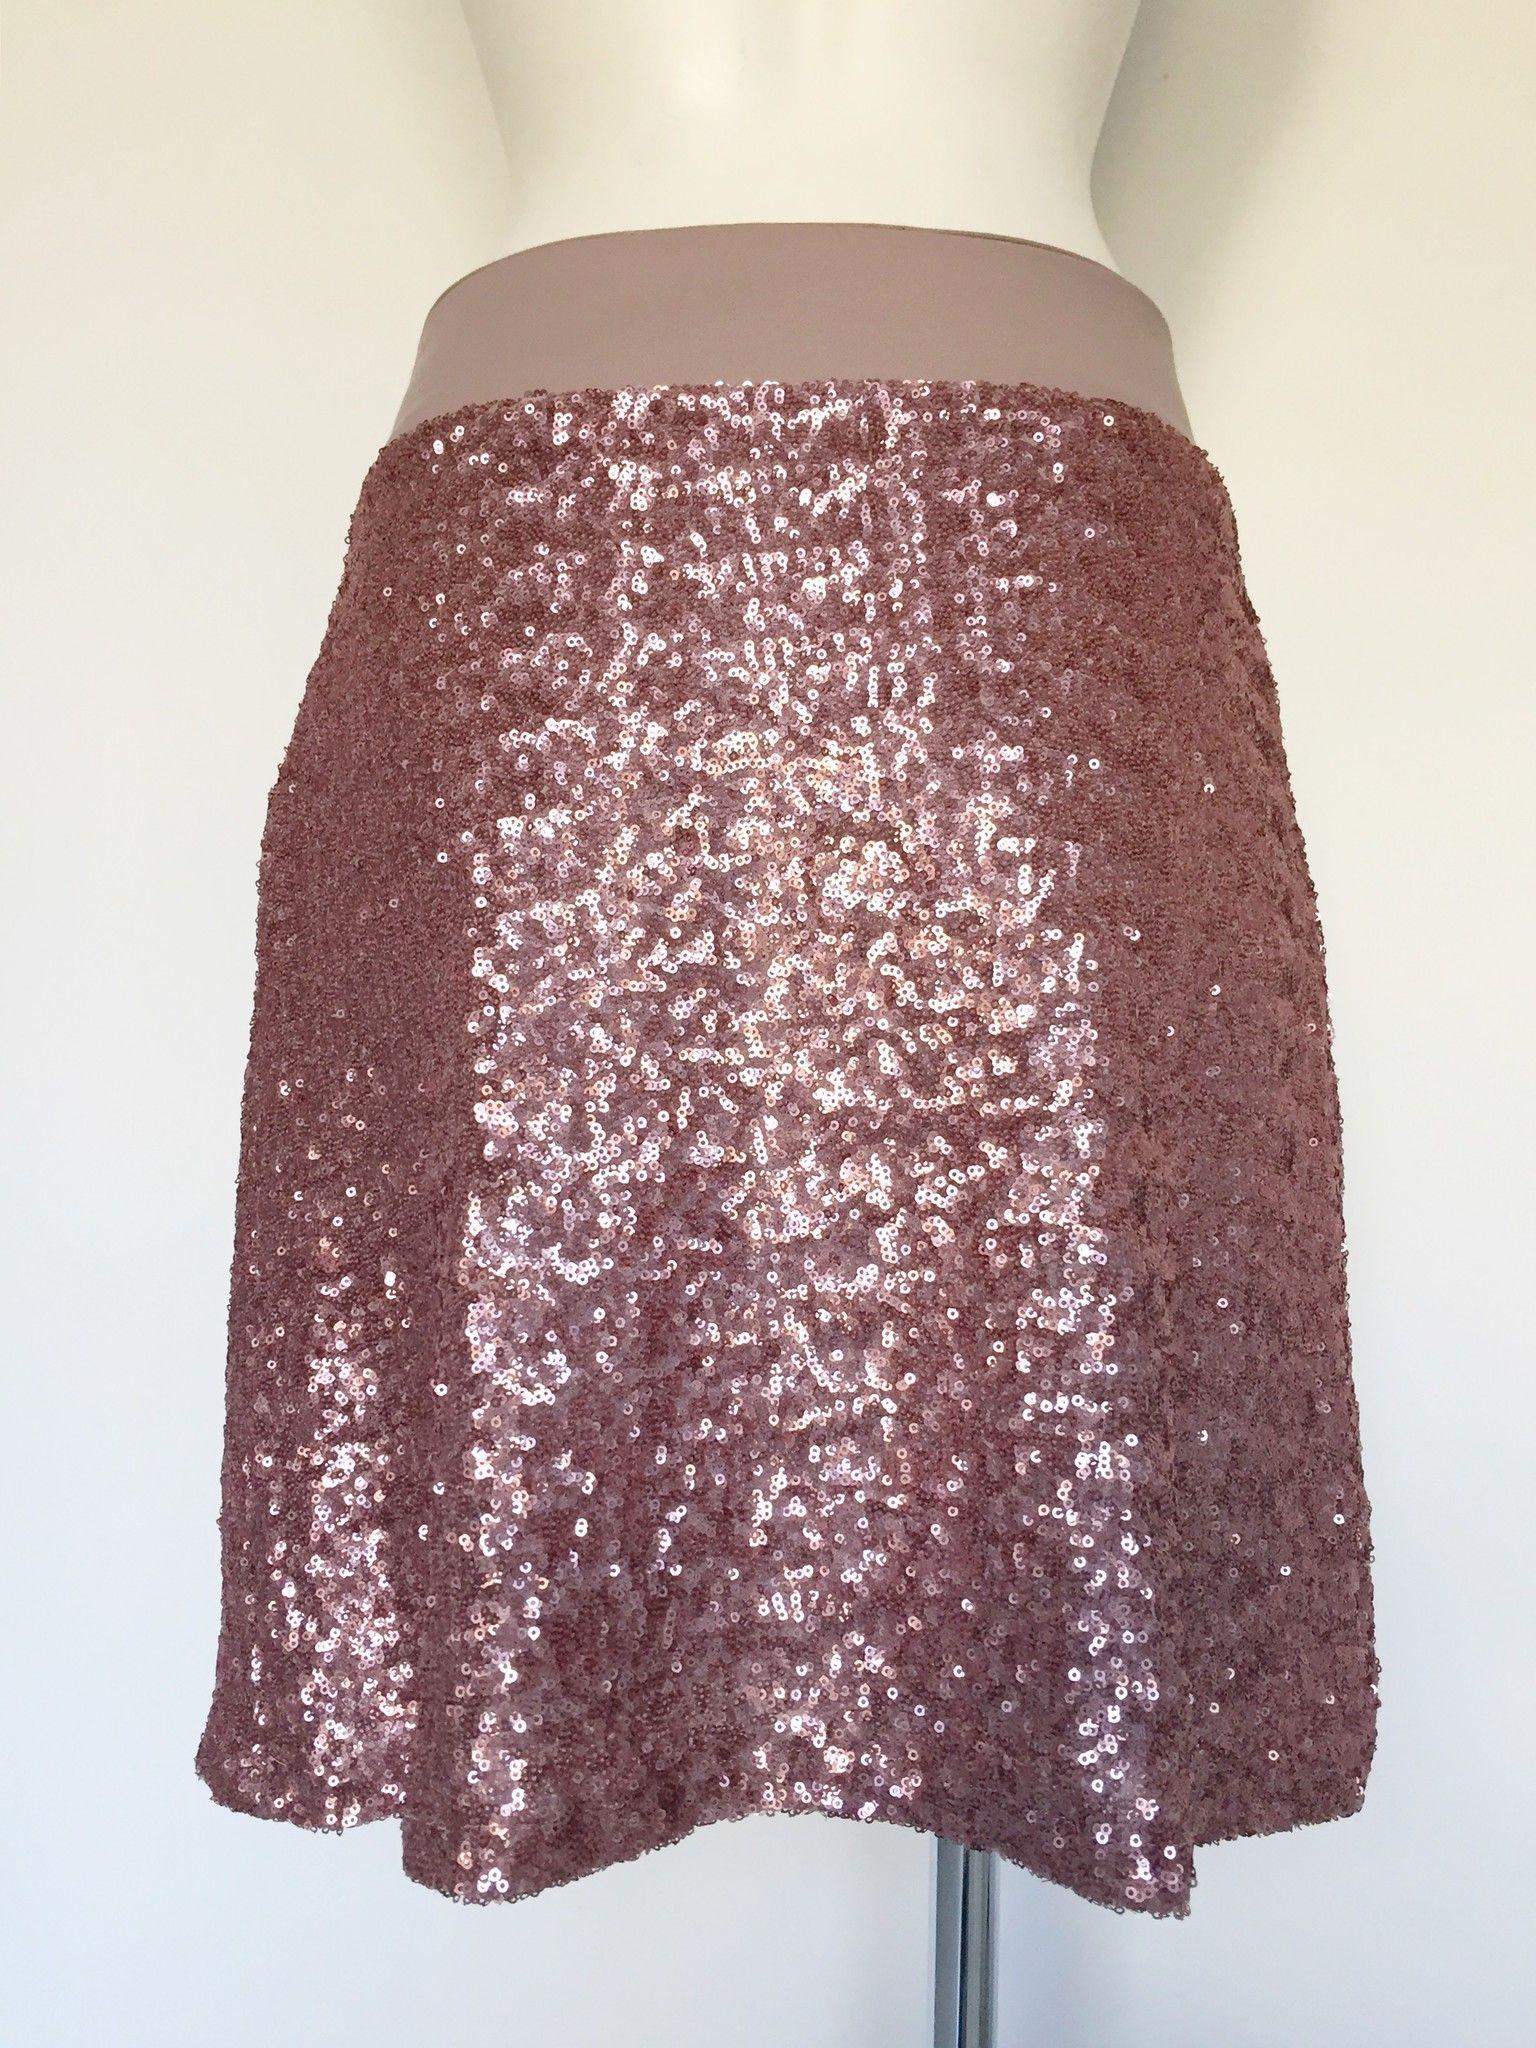 Manu Palmi Skirt with Paillettes Cod.E158